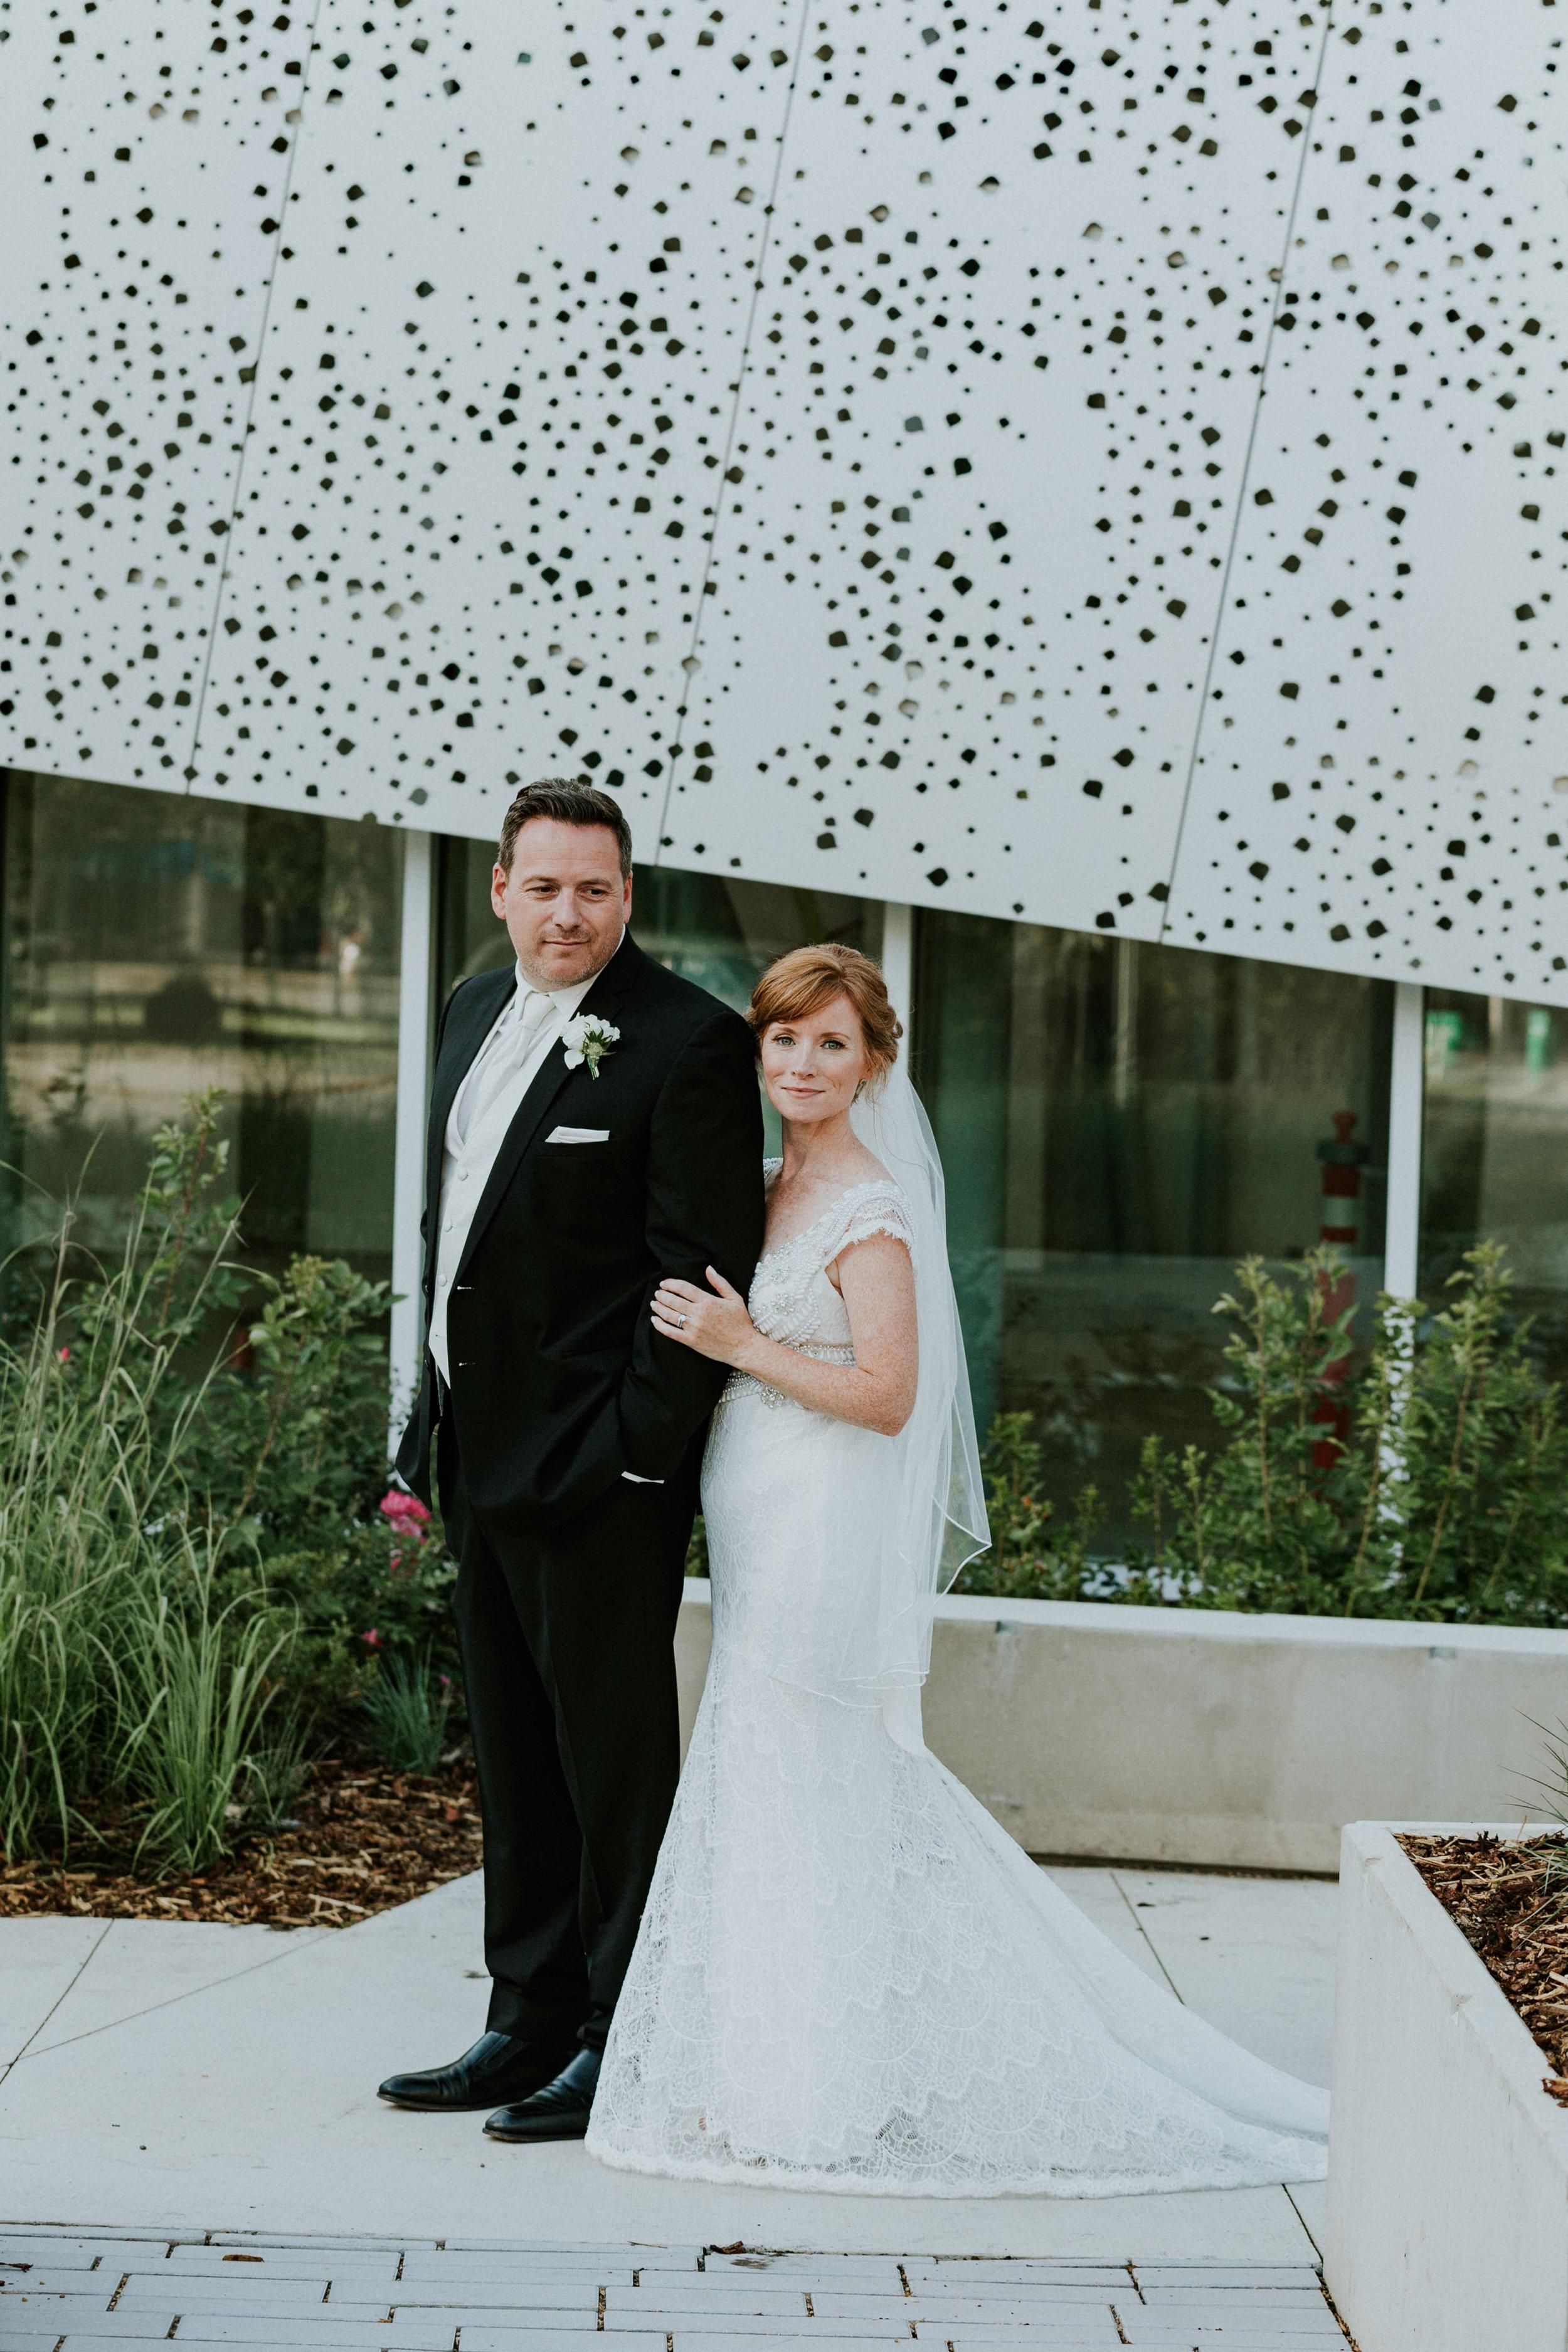 20170811_Lisa_Chris_Wedding_376.jpg